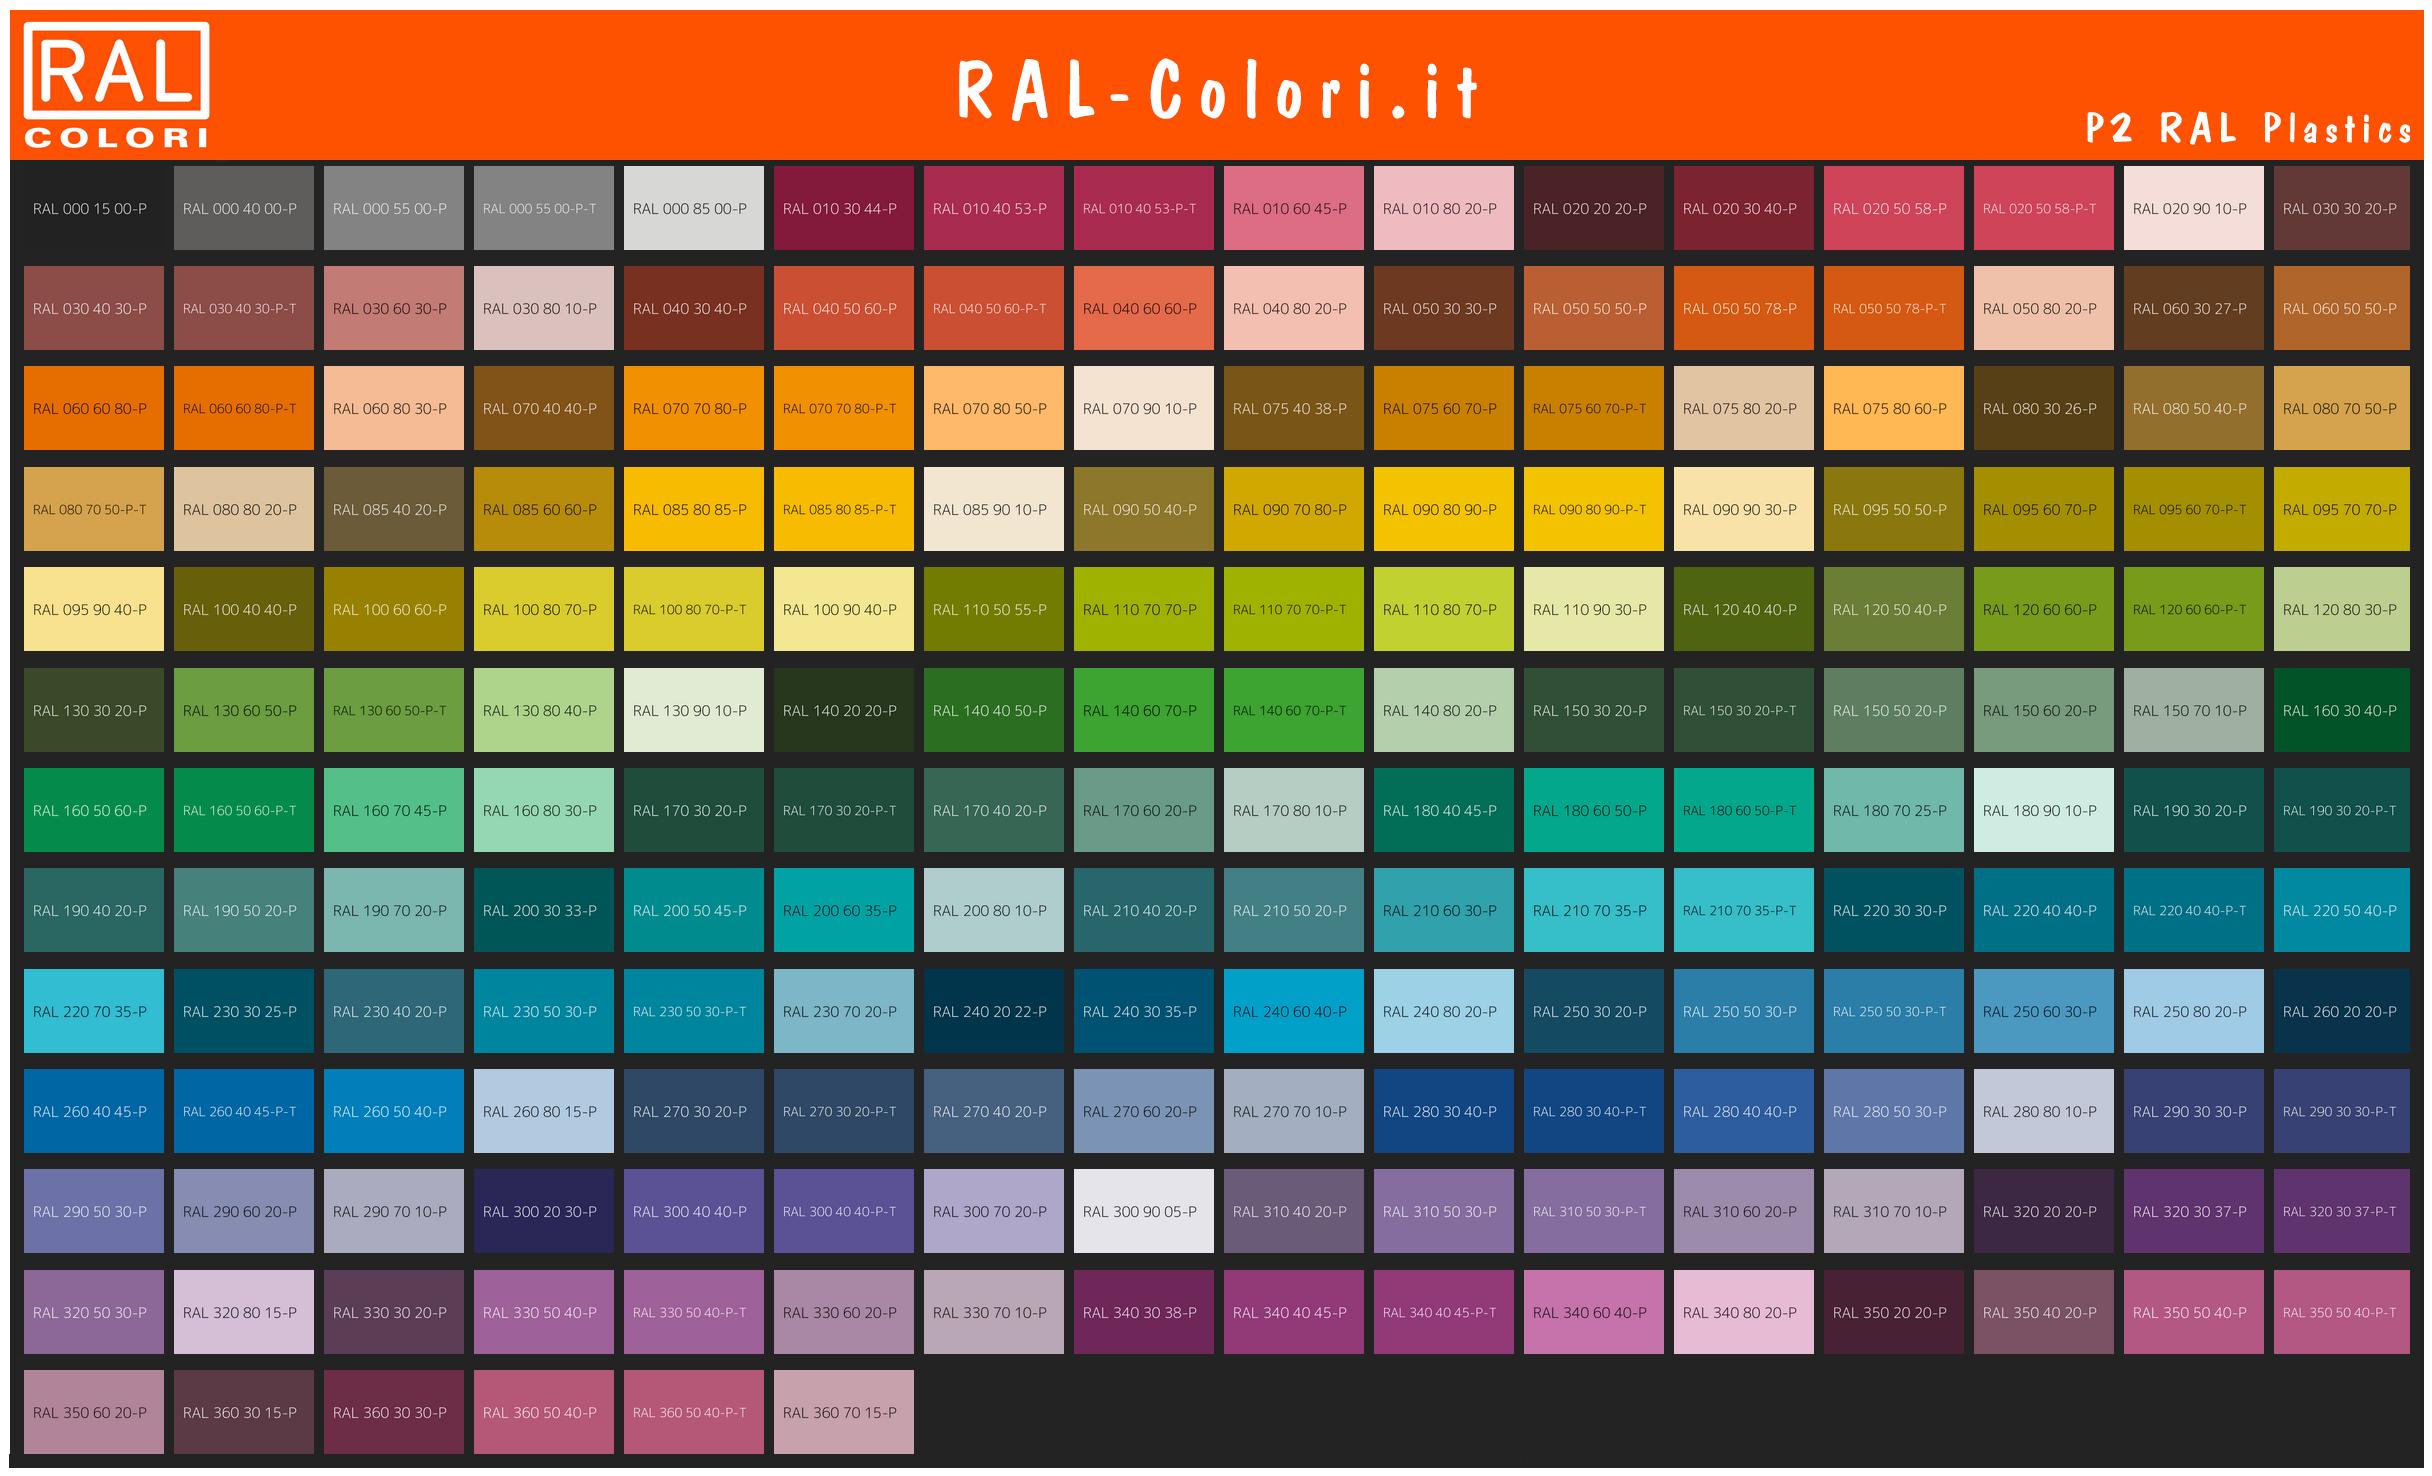 P2 RAL plastics cartella colori IT